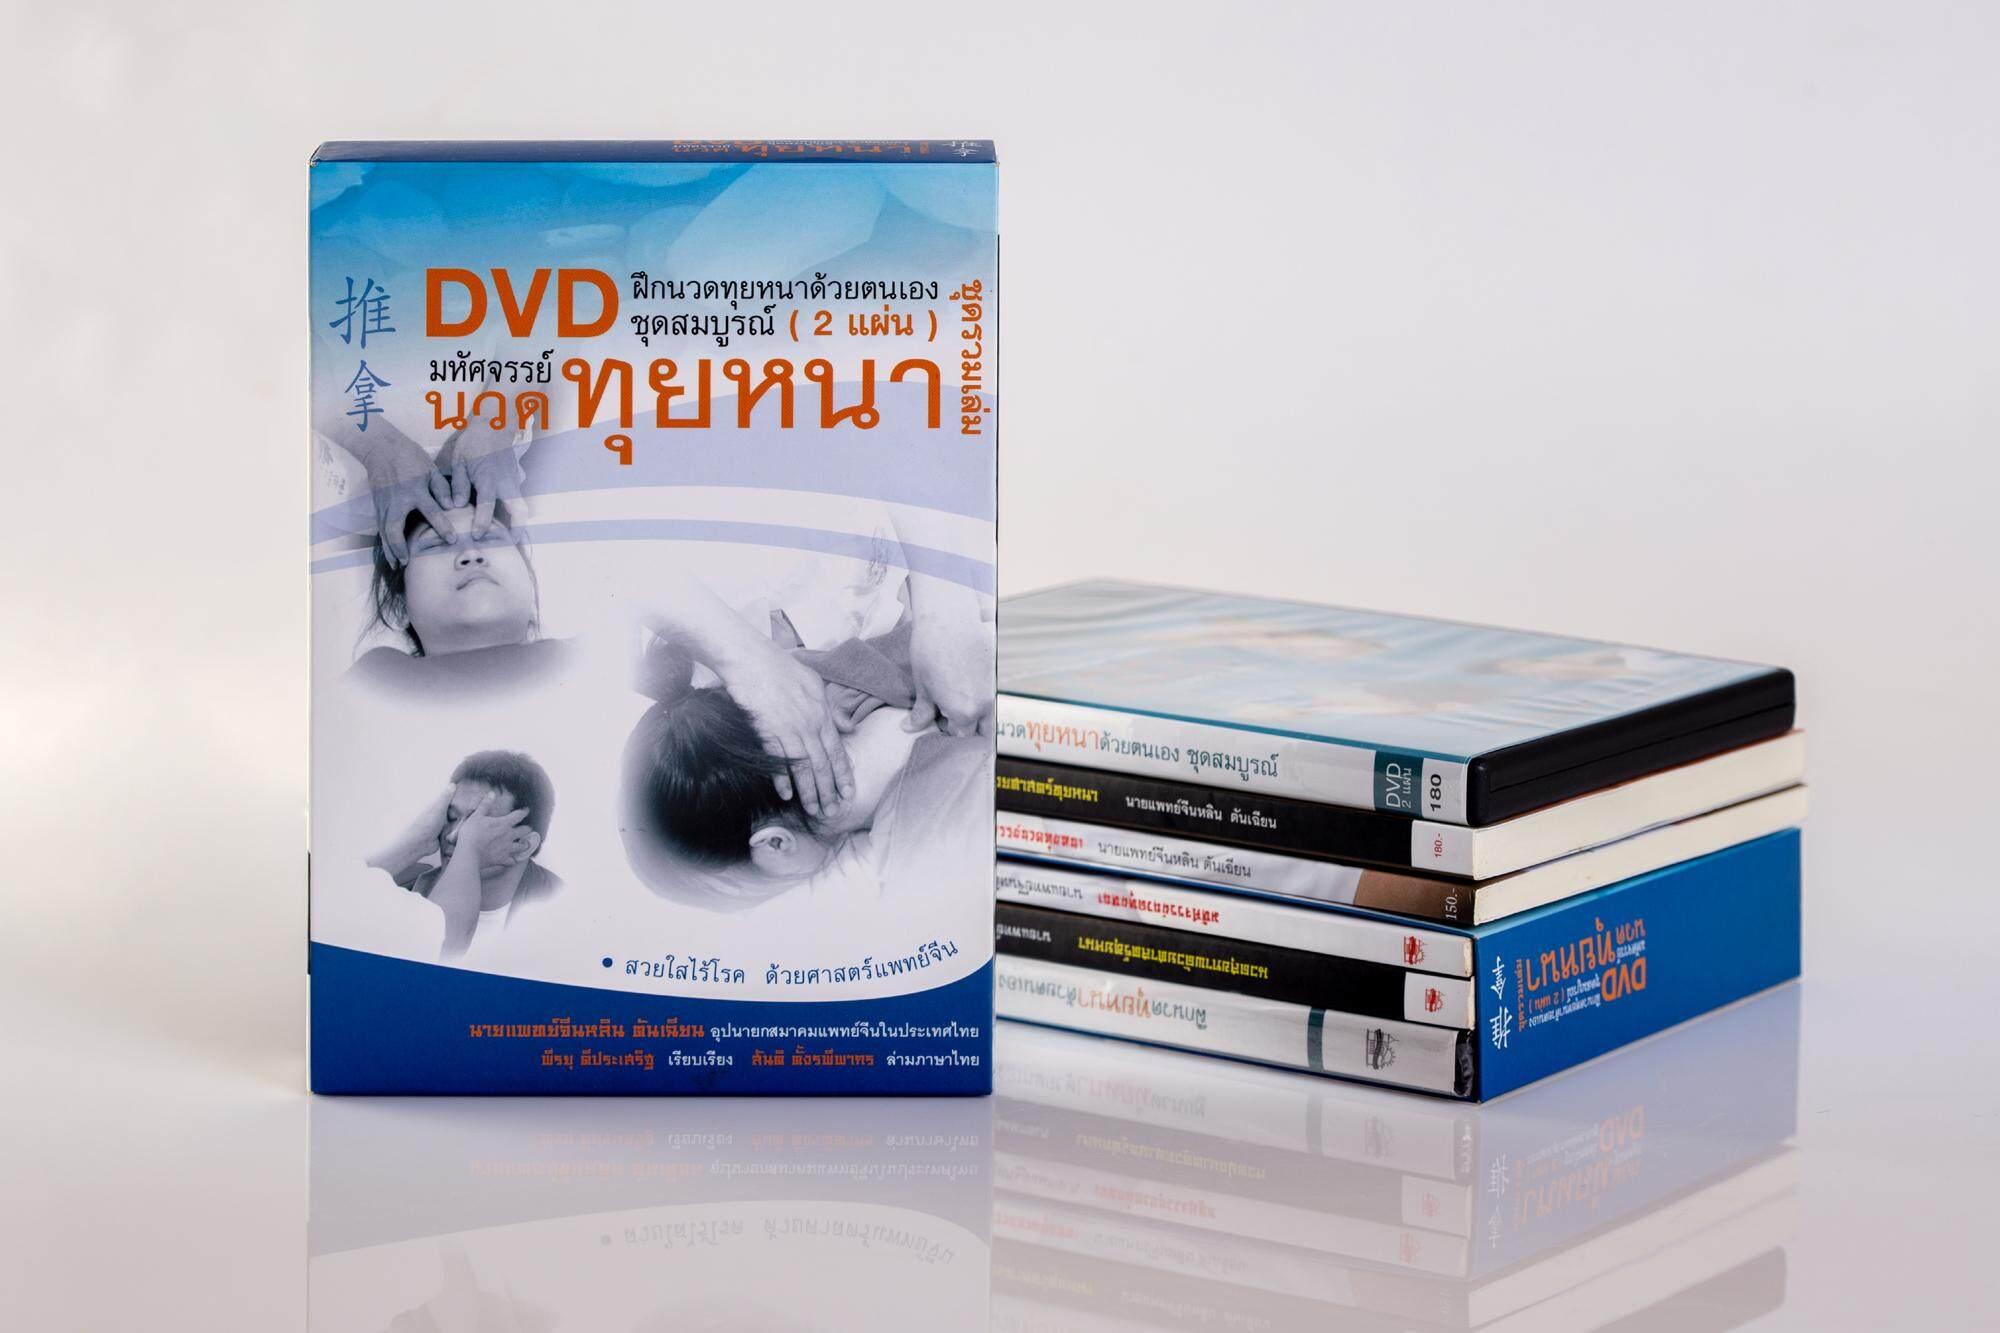 Box Set มหัศจรรย์นวดทุยหนา ชุดรวมเล่ม 1-2 พร้อม Dvd .